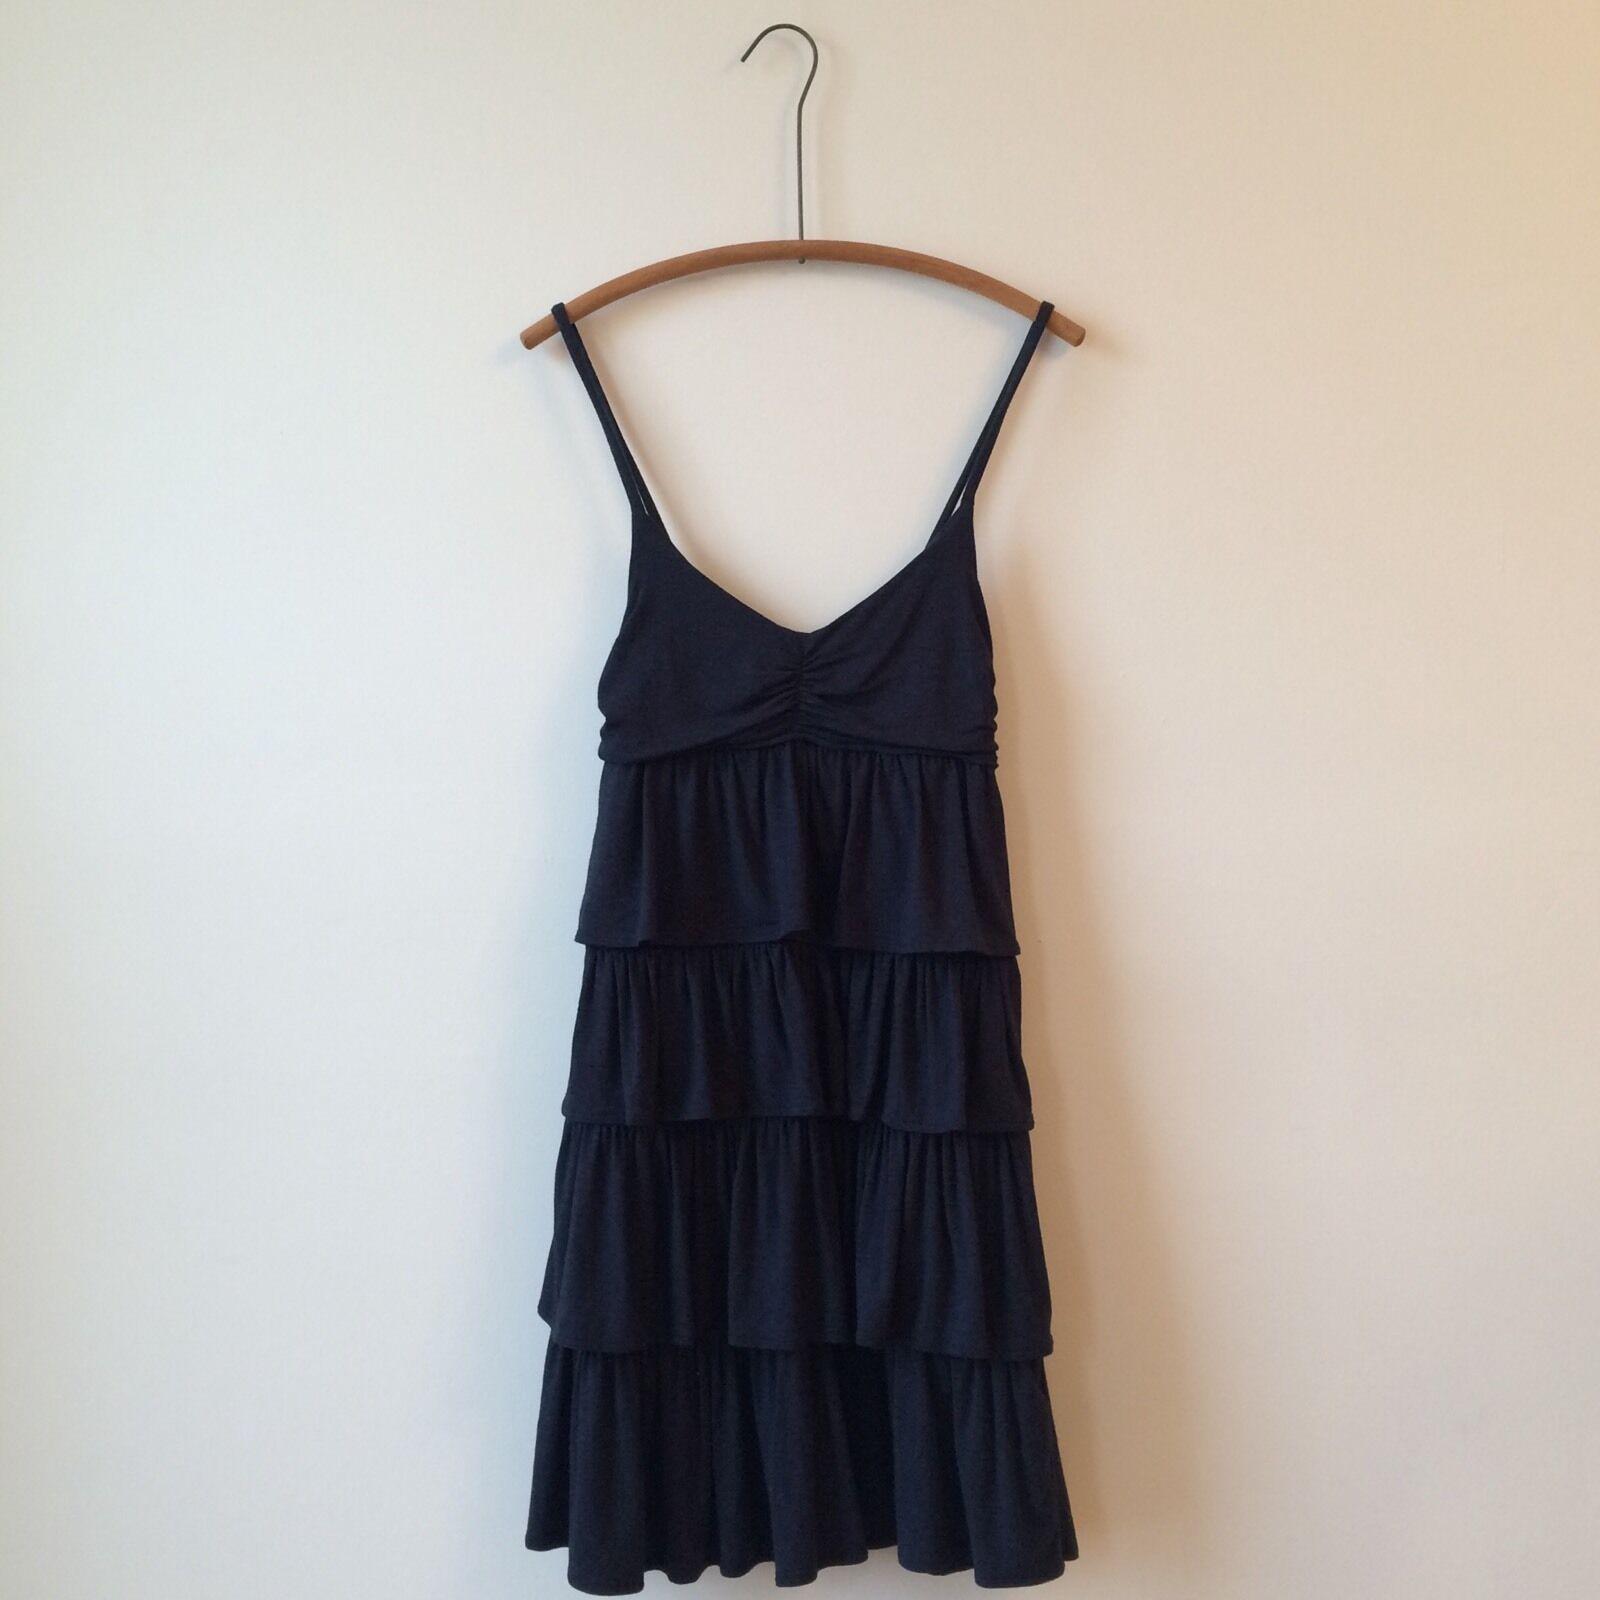 J. Crew Heather Slate bluee Modal Jersey Ruffle Tiered Strappy Dress Sz S PERFECT